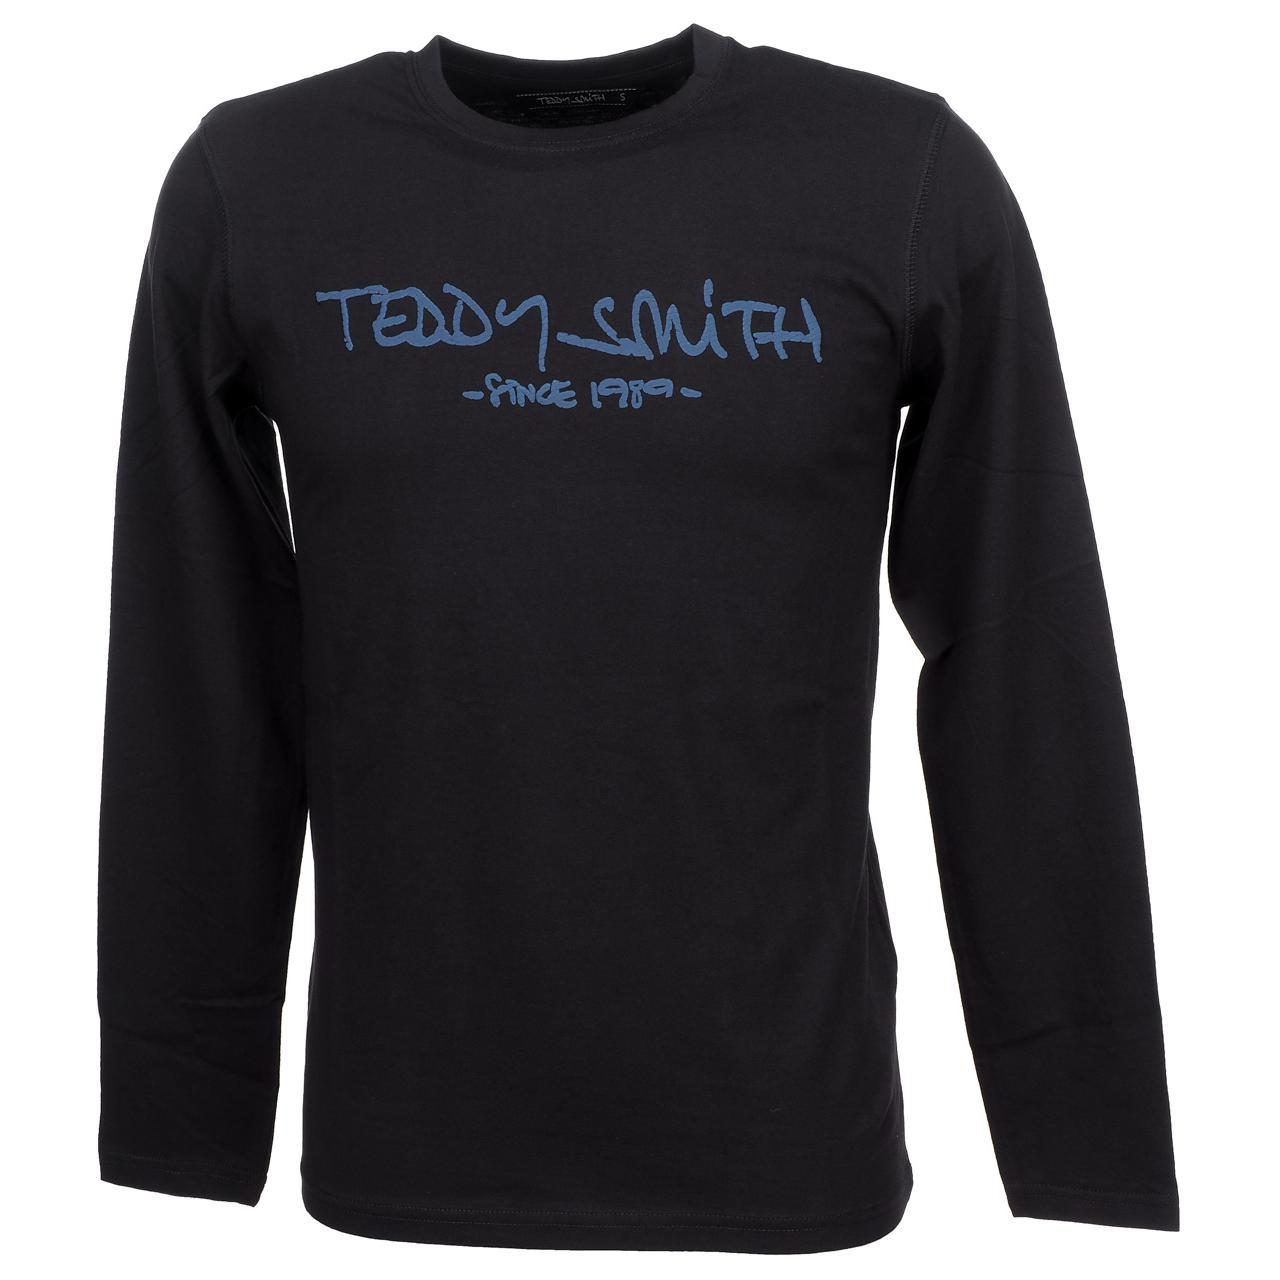 T-Shirt-Long-Sleeves-Teddy-Smith-Ticlass-3-Dk-Navy-ML-Tee-Blue-59454-New